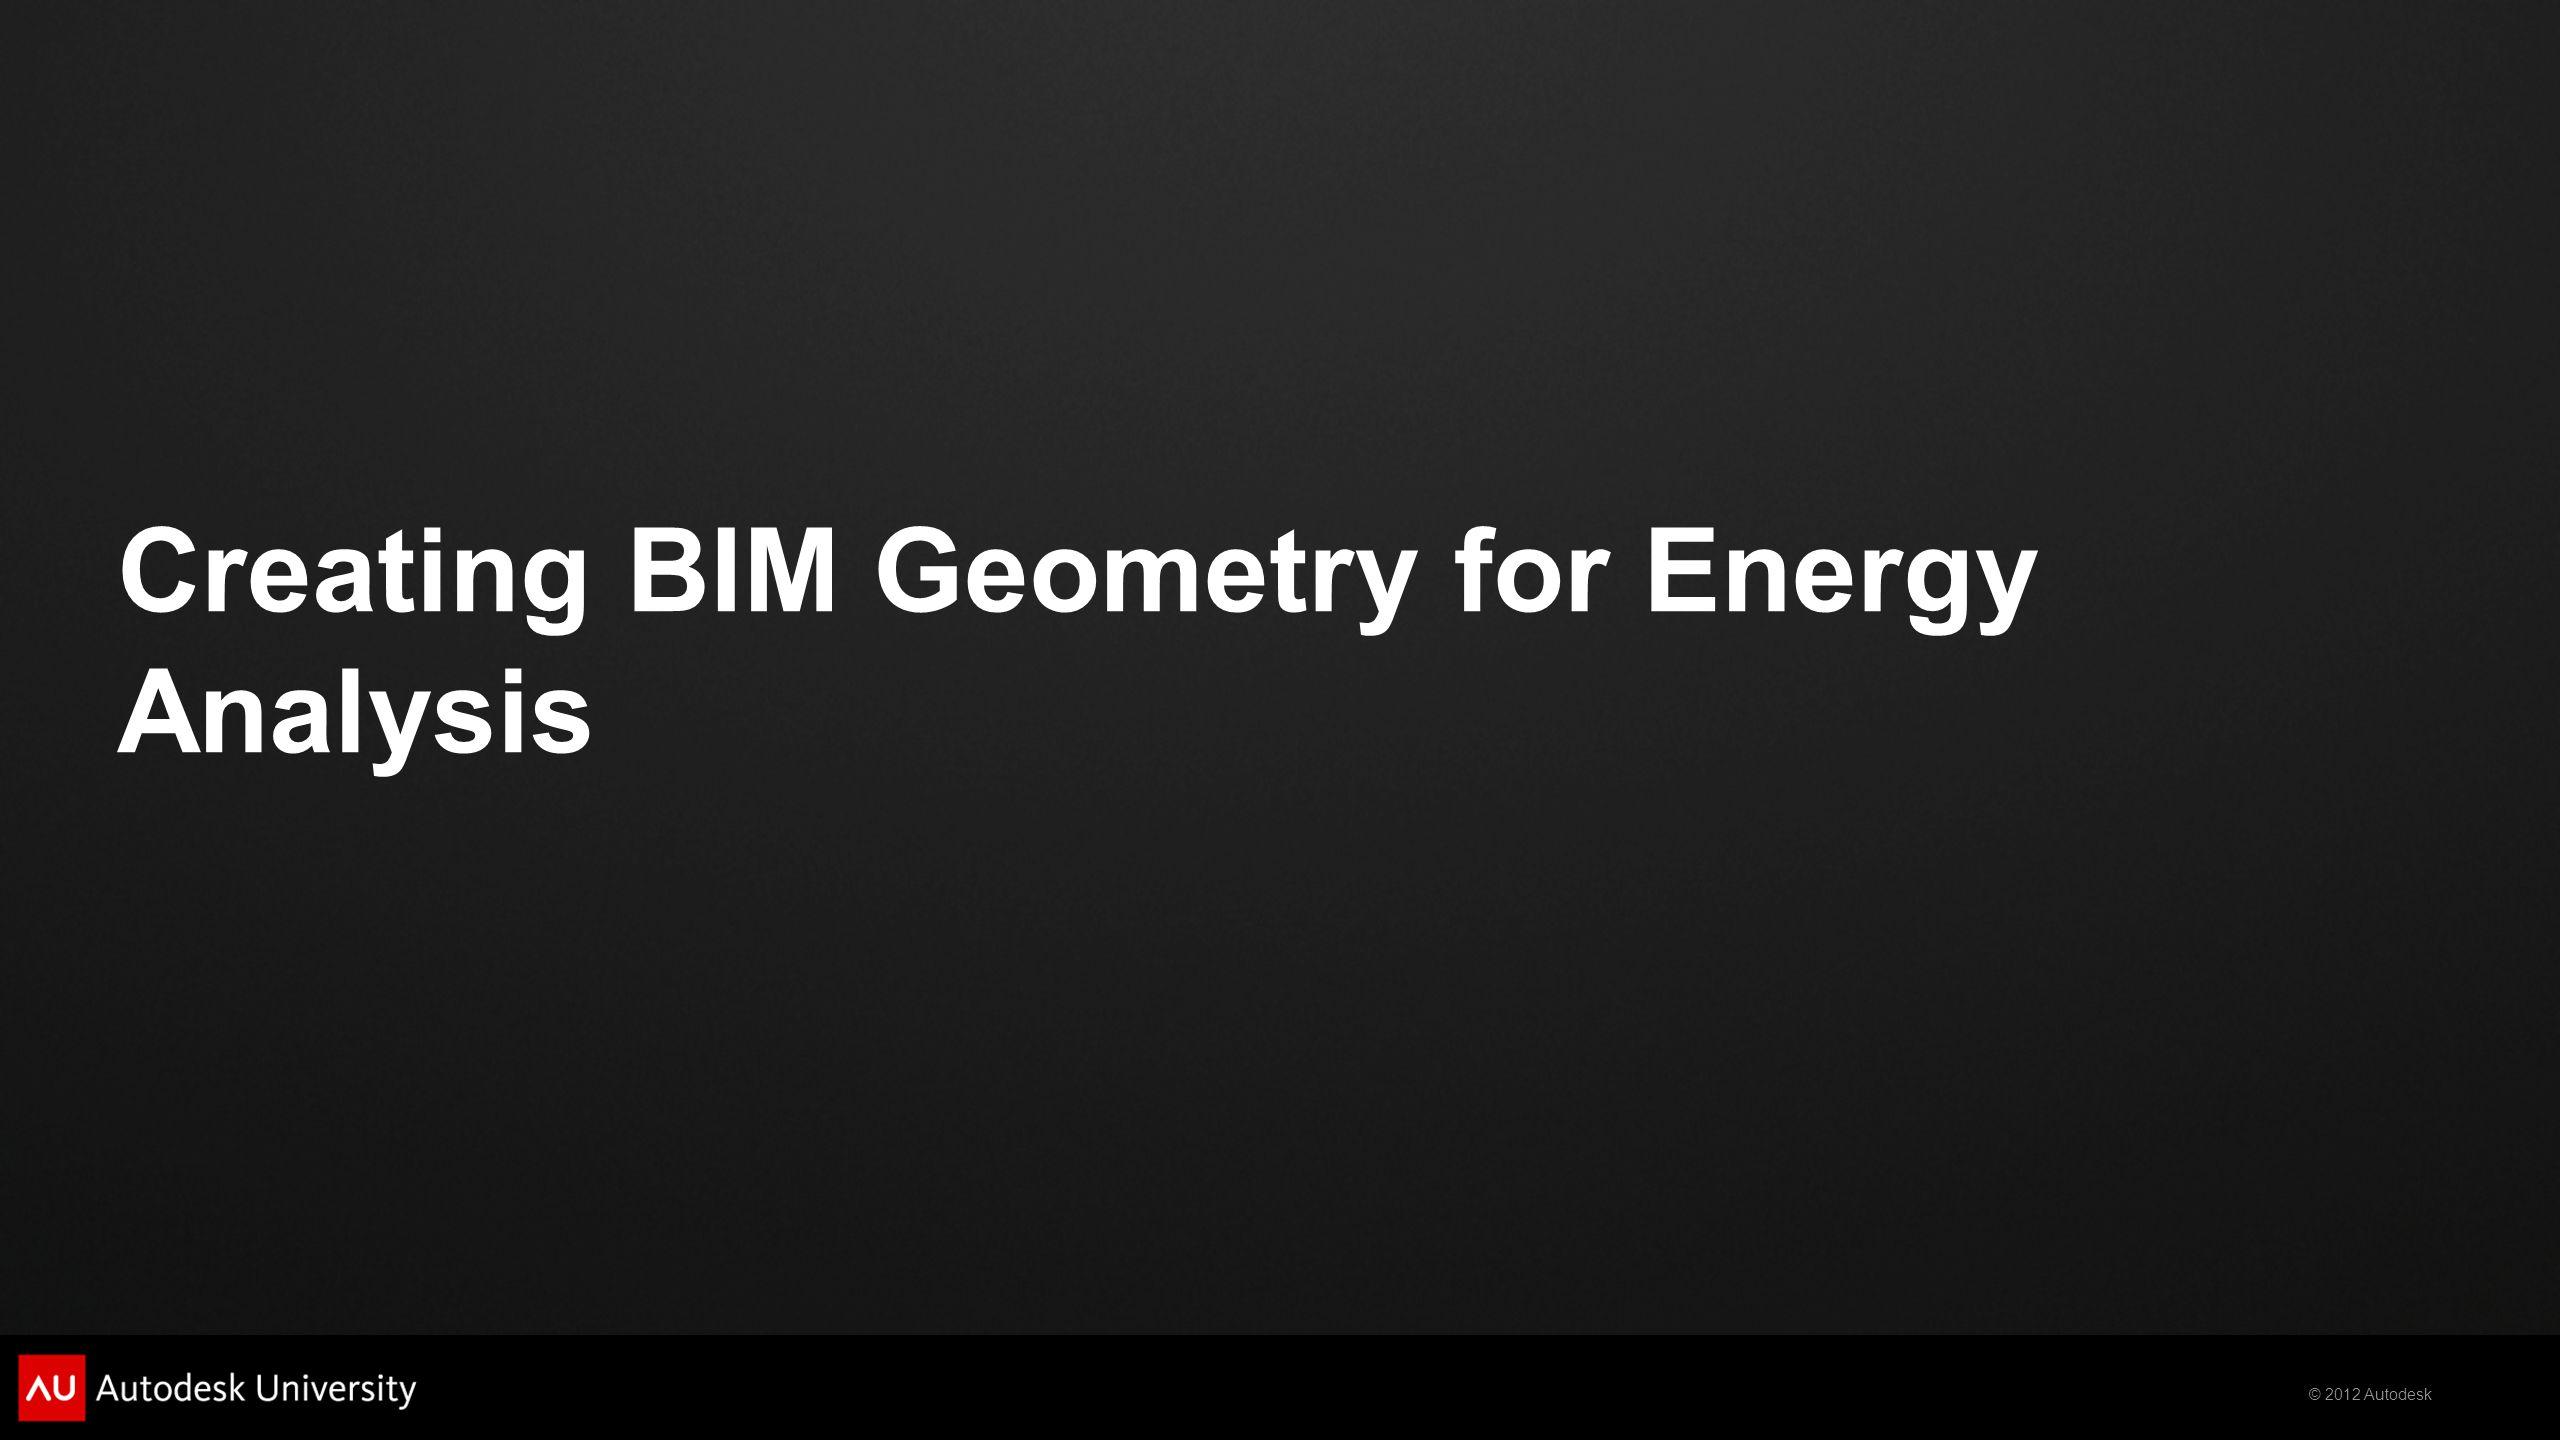 Creating BIM Geometry for Energy Analysis